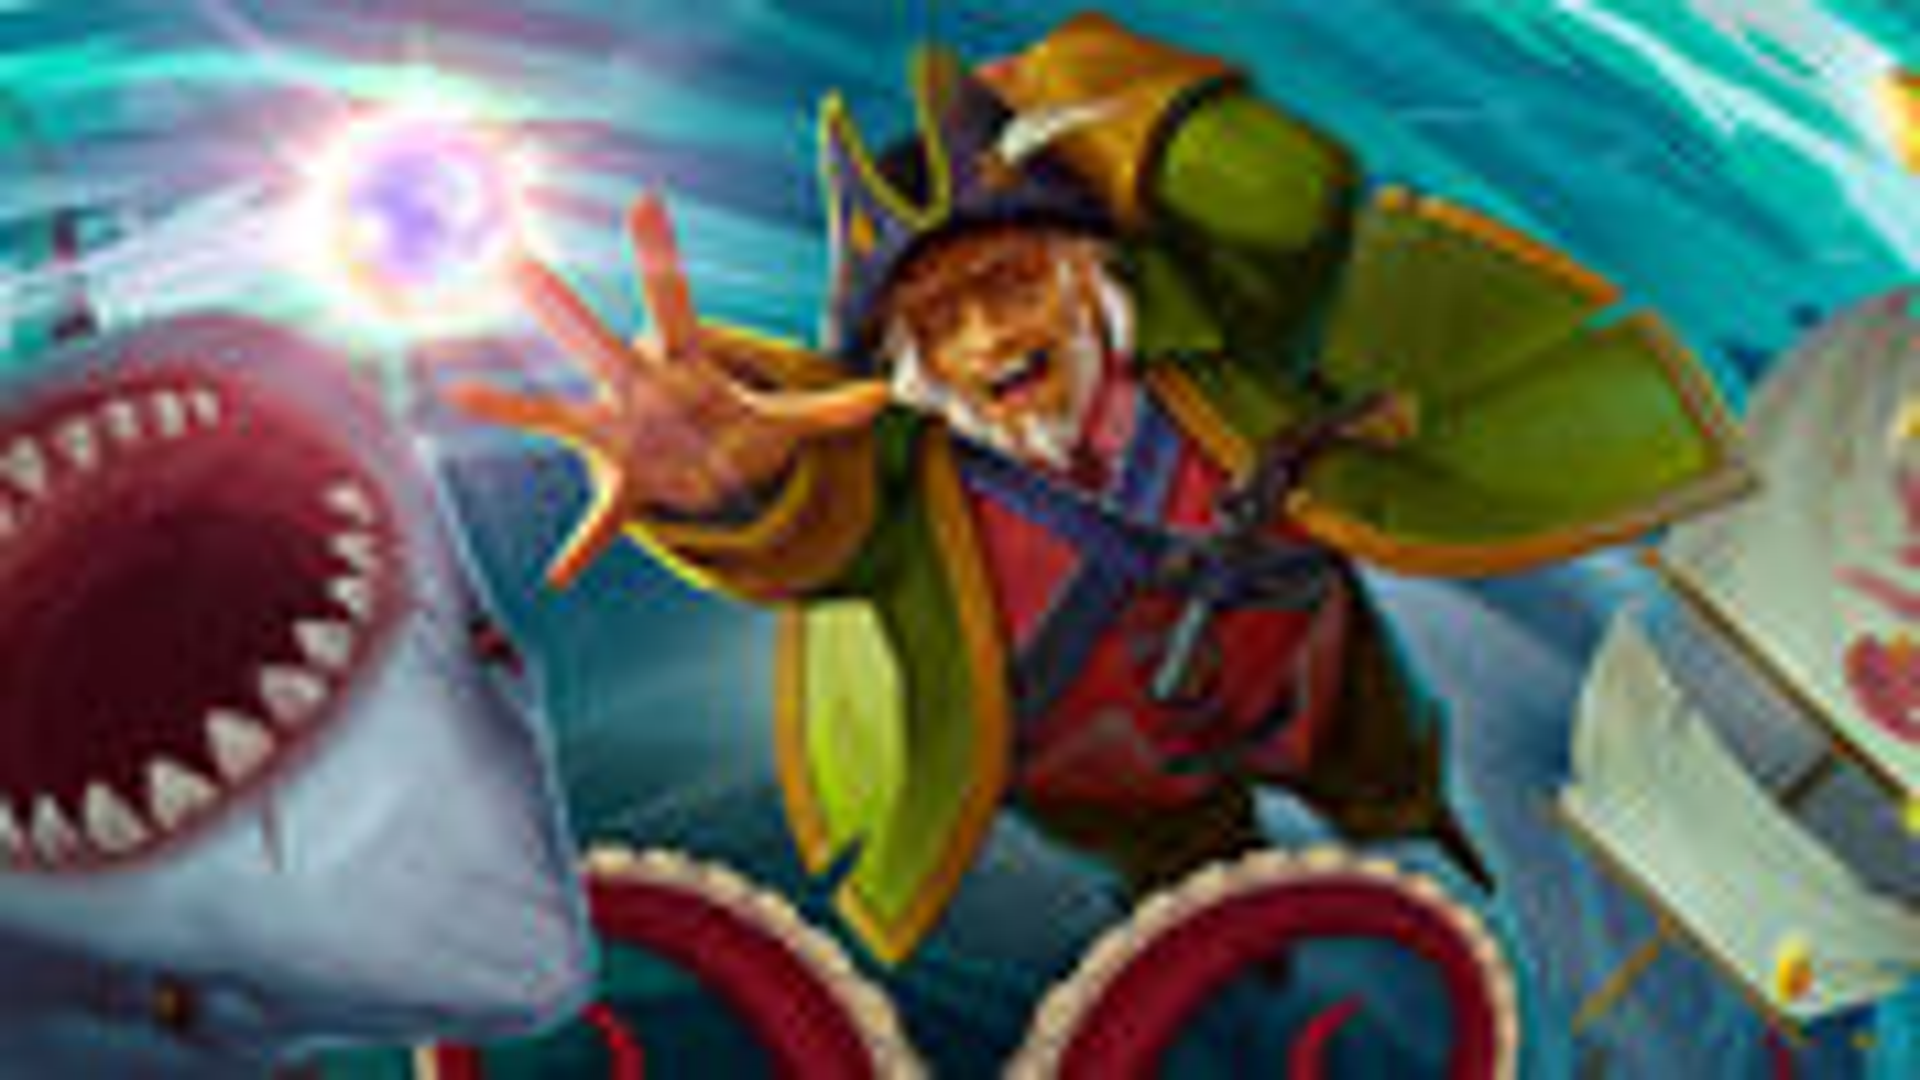 Forgotten Waters board game artwork retail release postponed